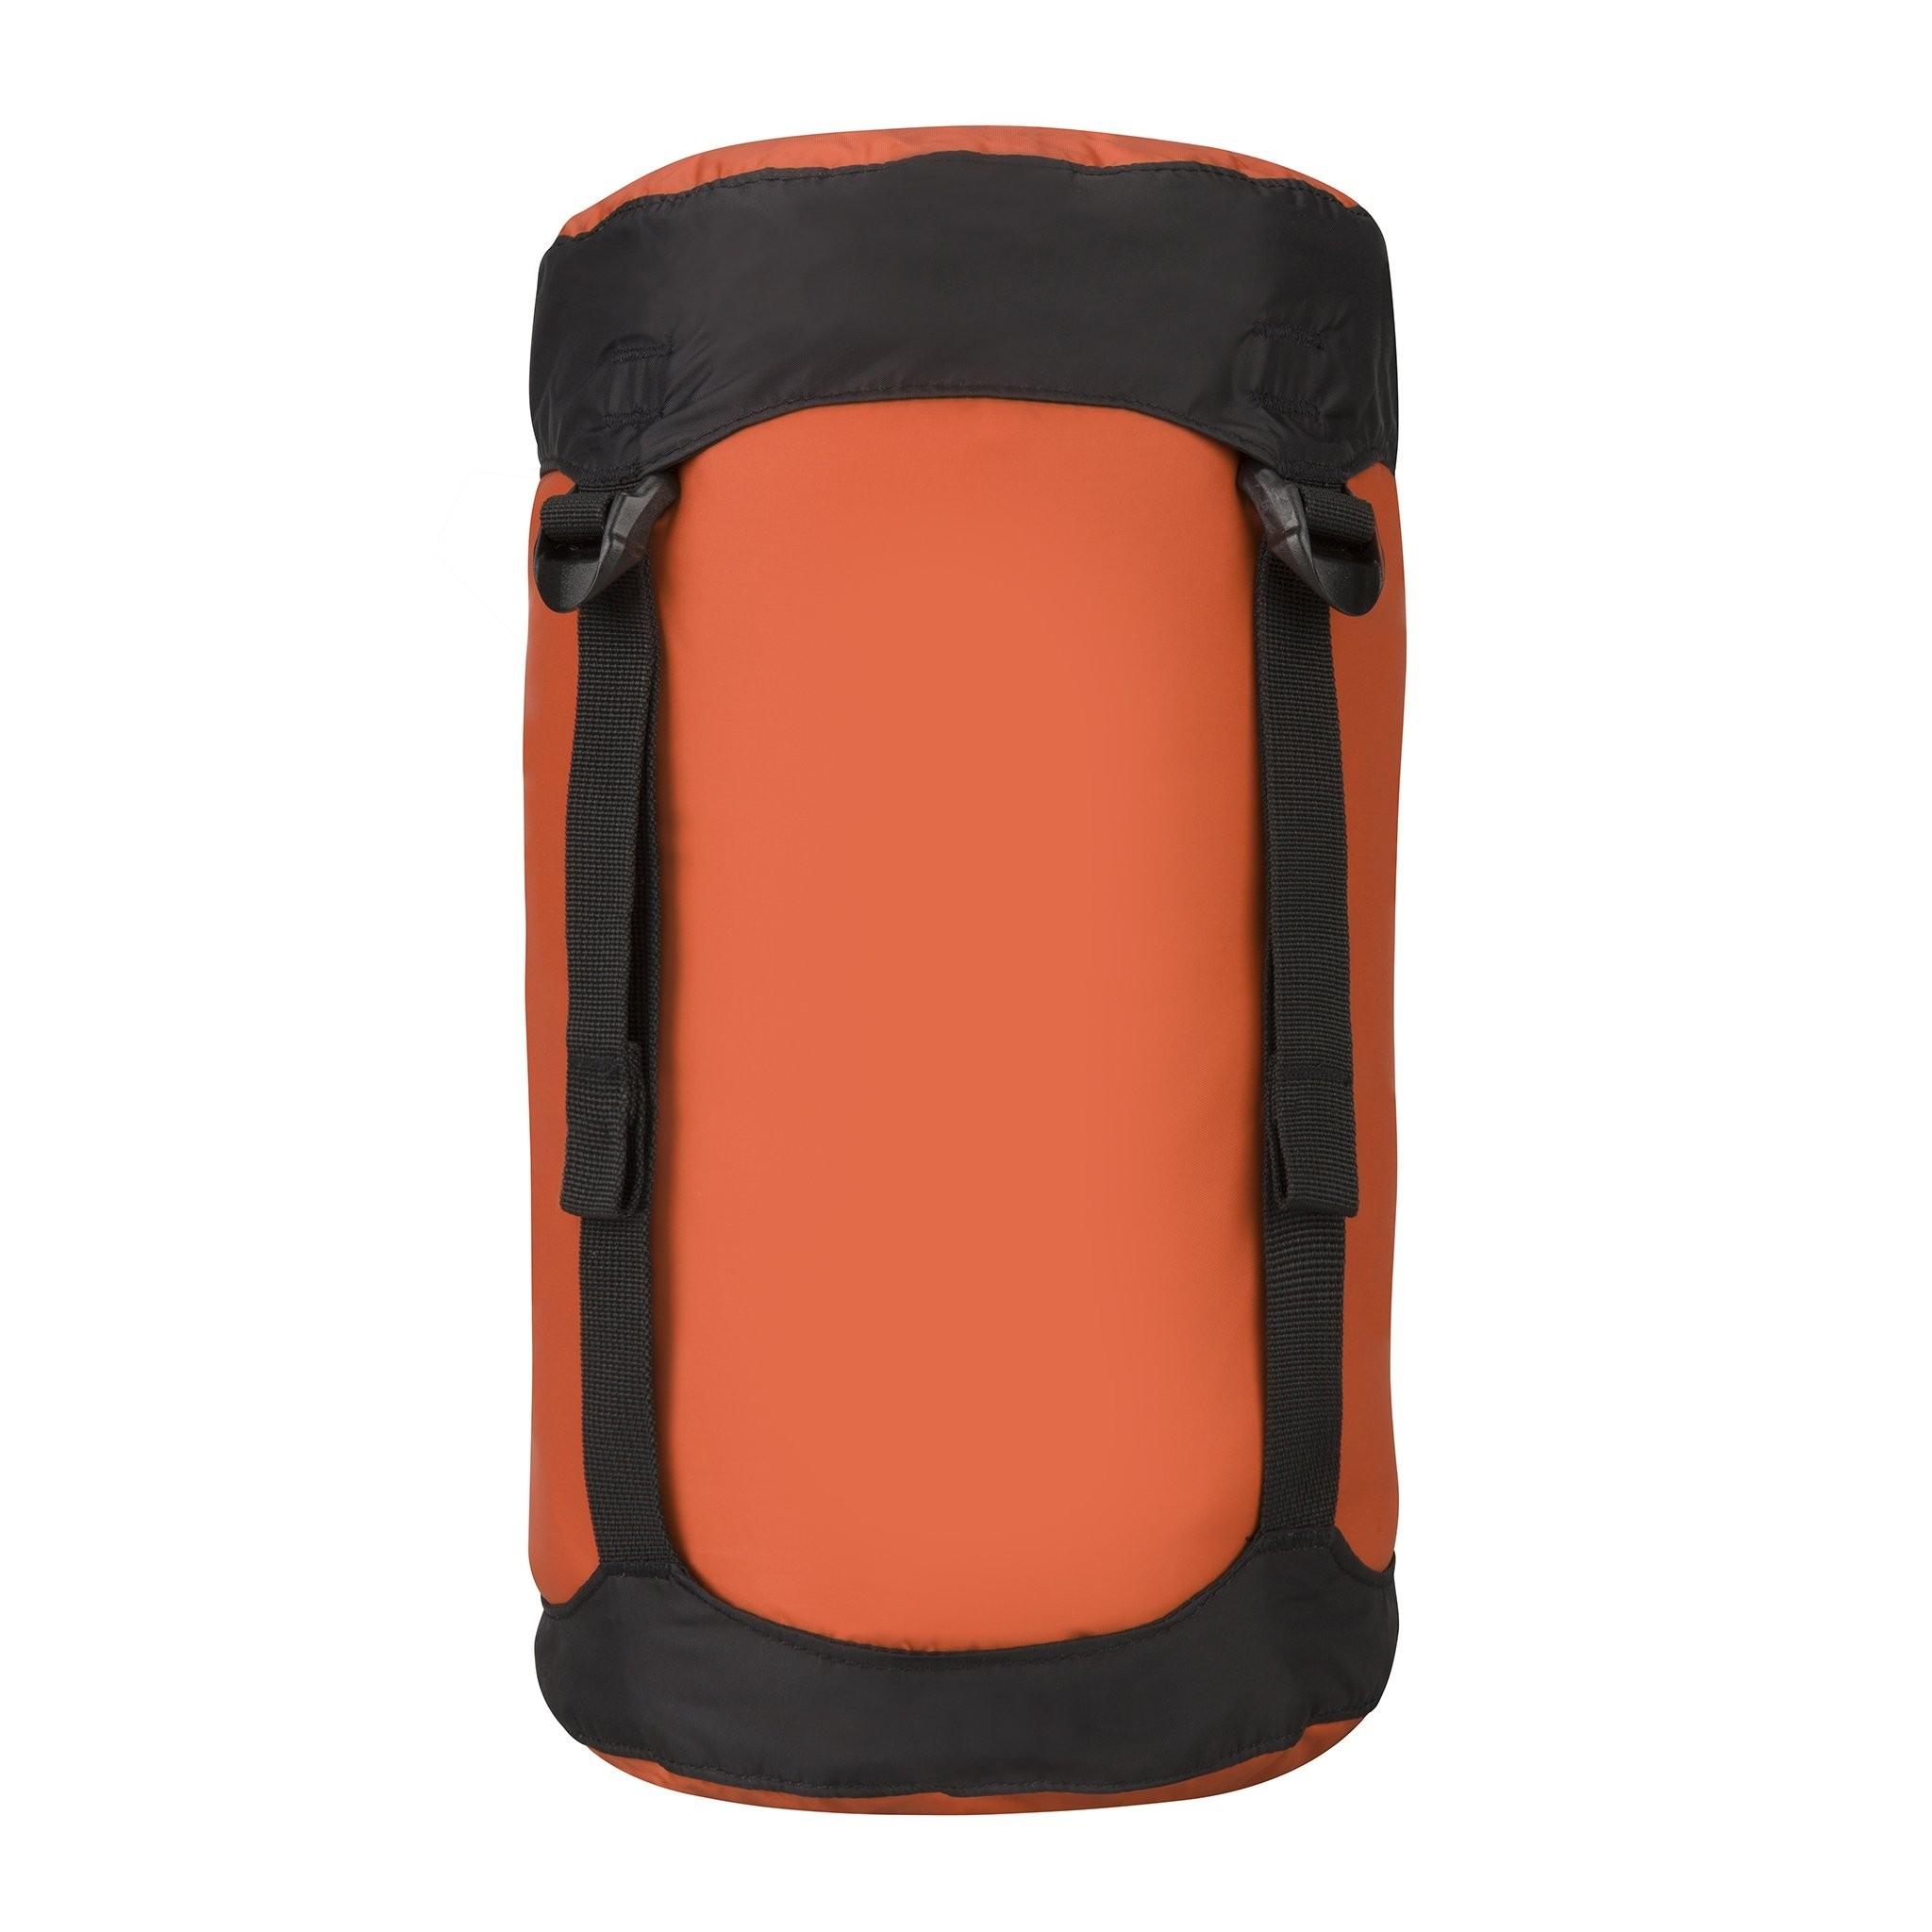 Sea to Summit Compression Sack - S - Orange